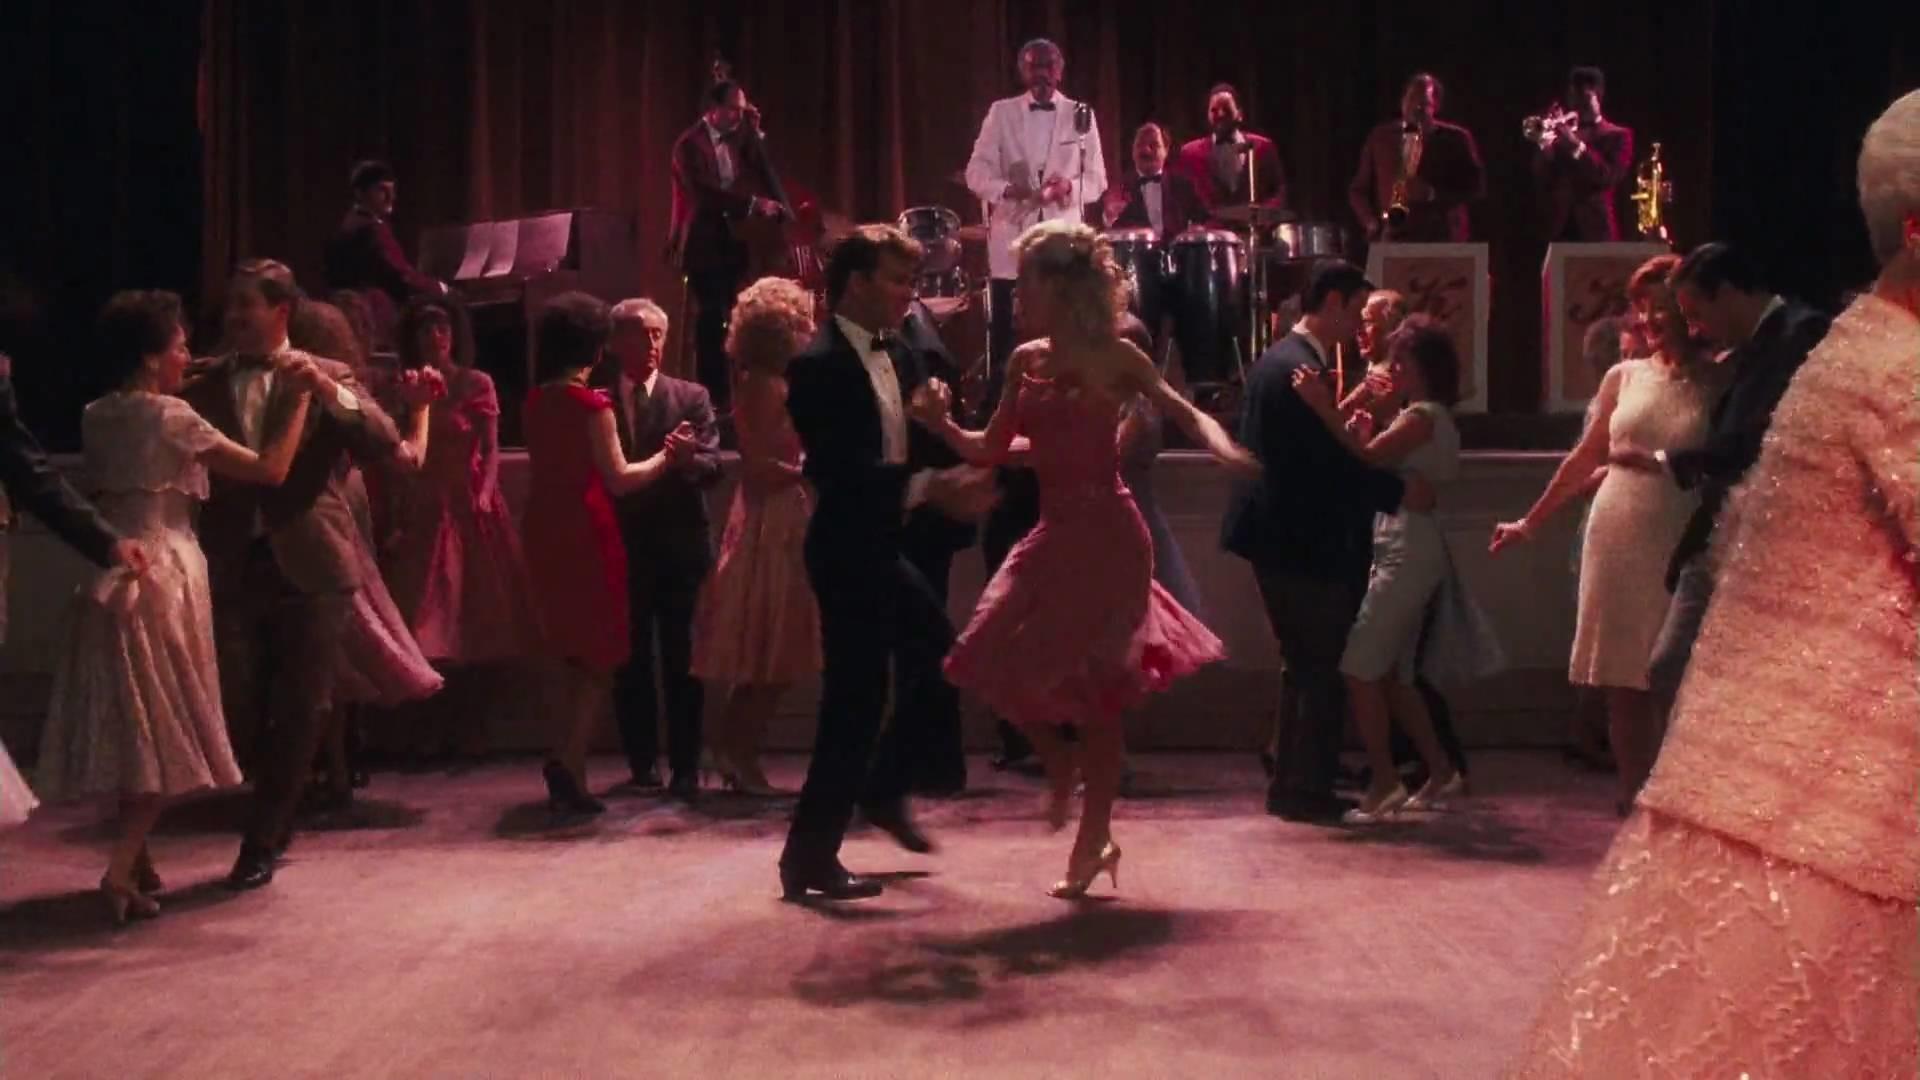 Res: 1920x1080, Exclusive Dirty Dancing Screenings